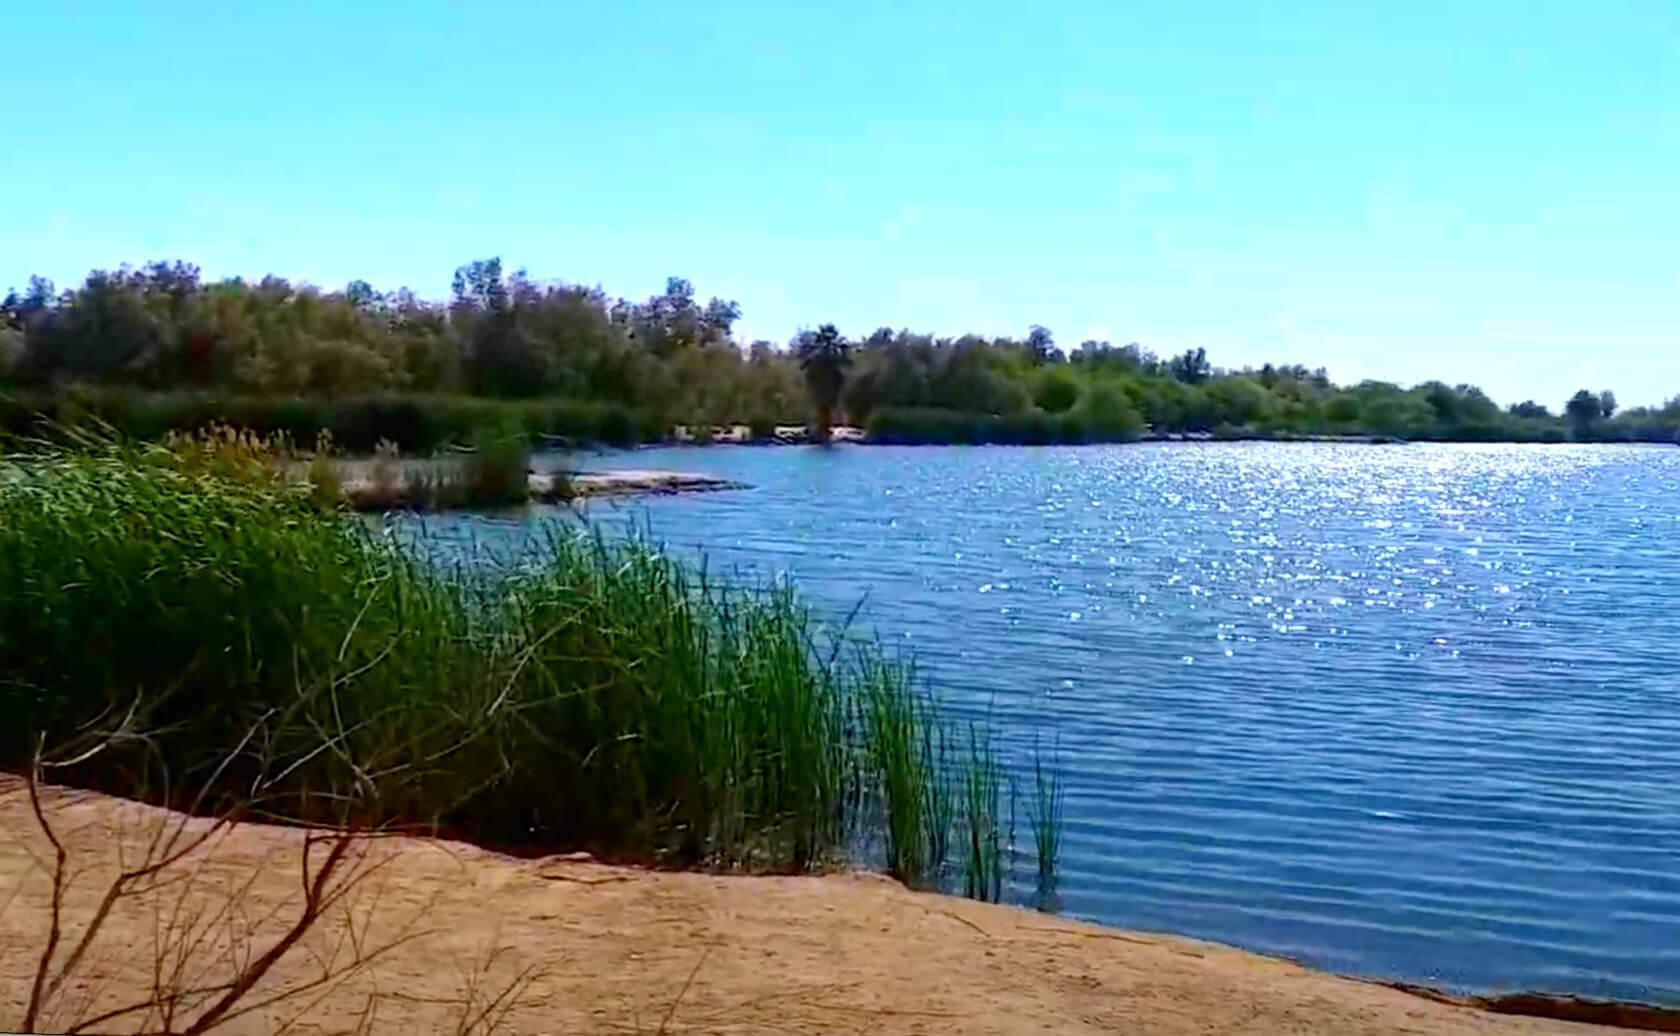 Fortuna-Lake-Fishing-Guide-Report-Yuma-AZ-07